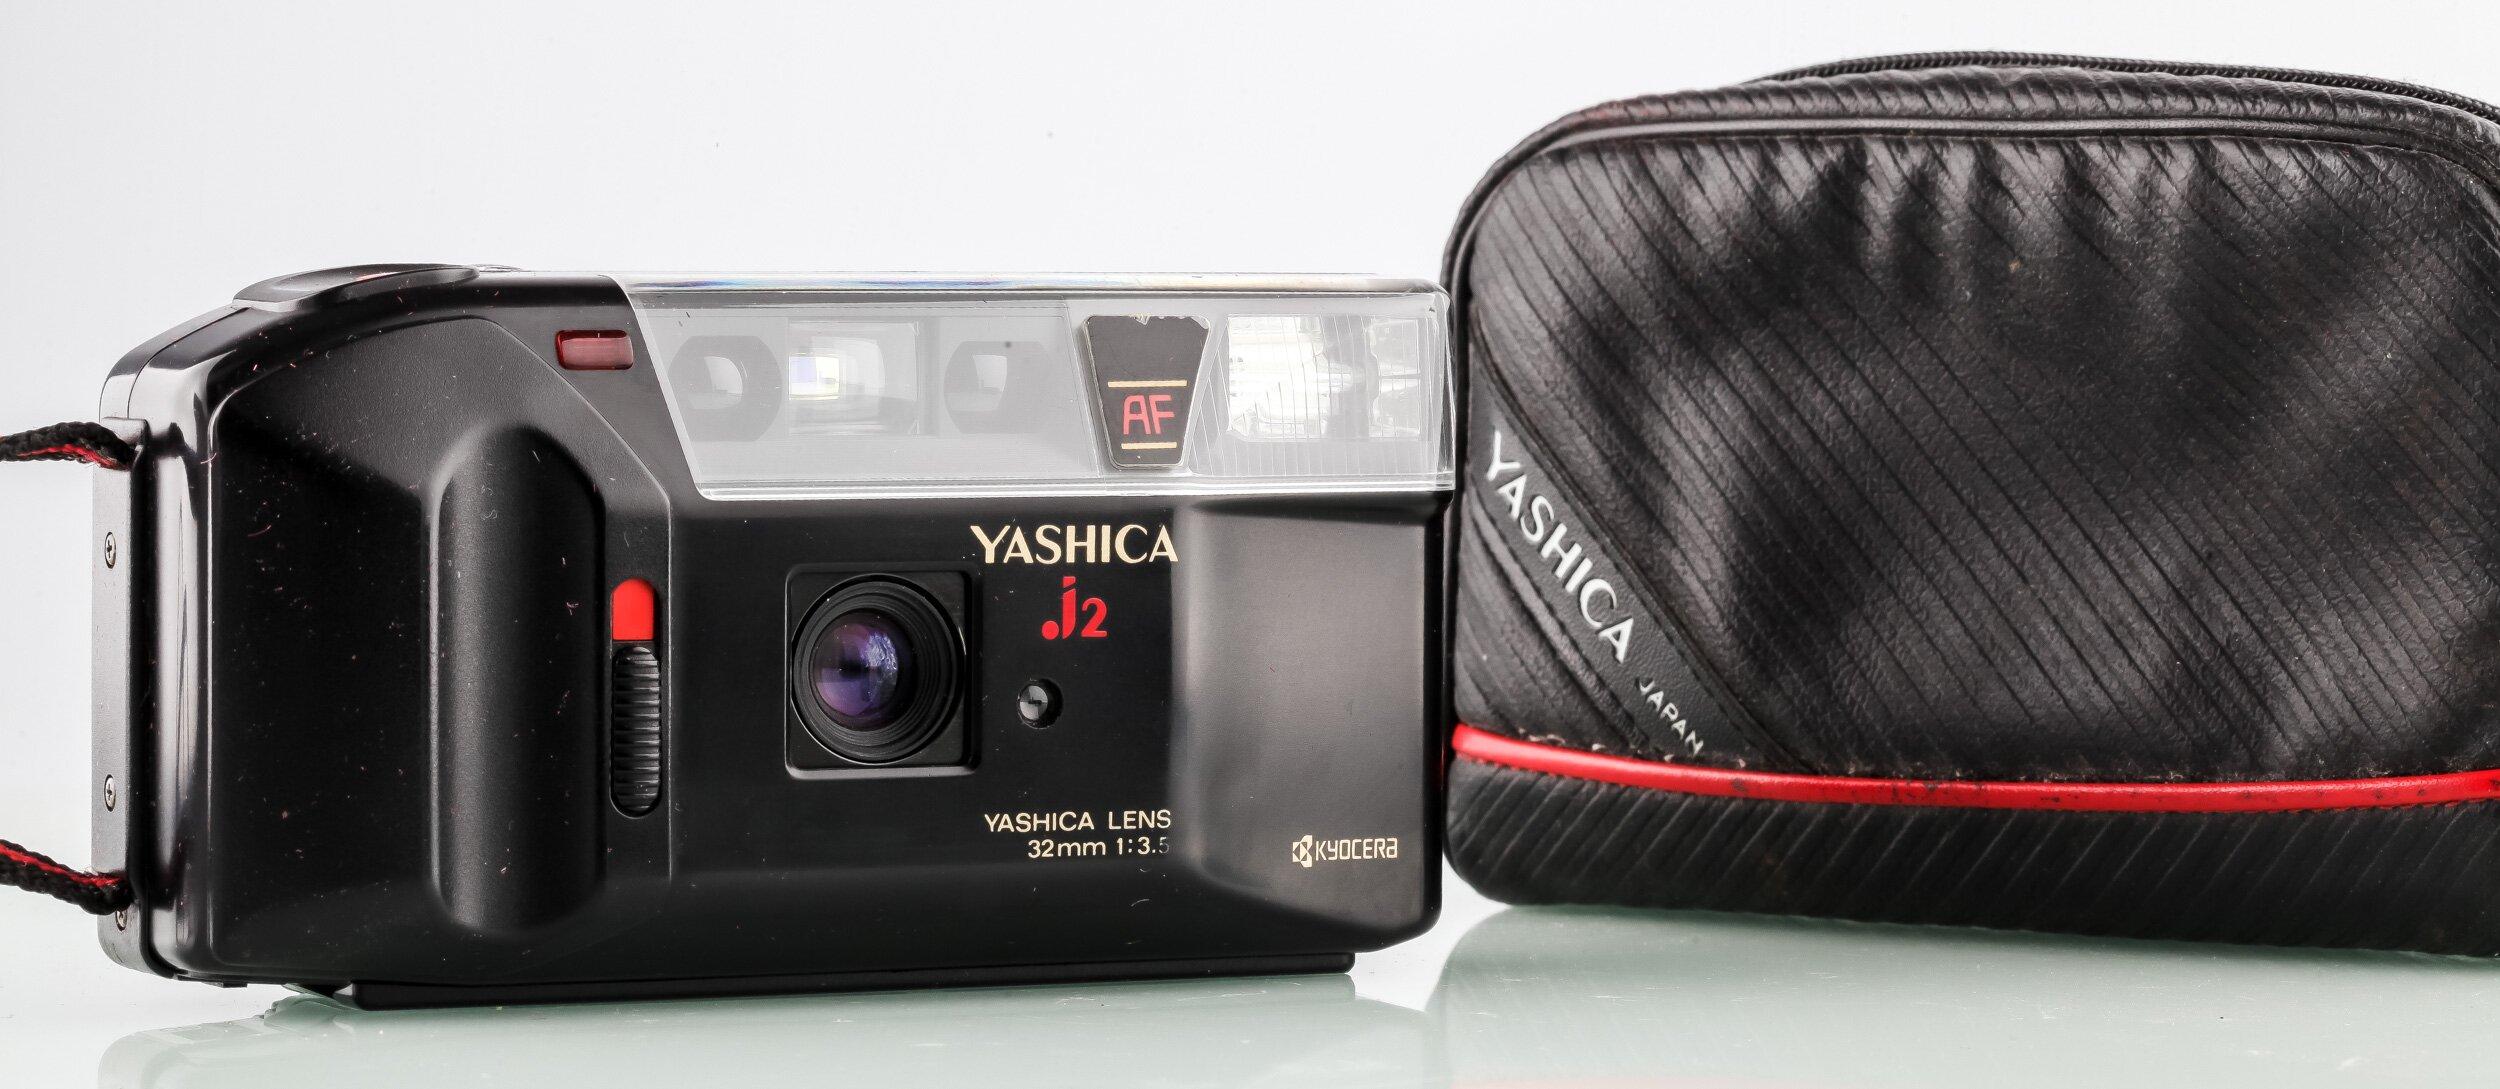 Yashica J2 mit 32mm 3,5 Kamera